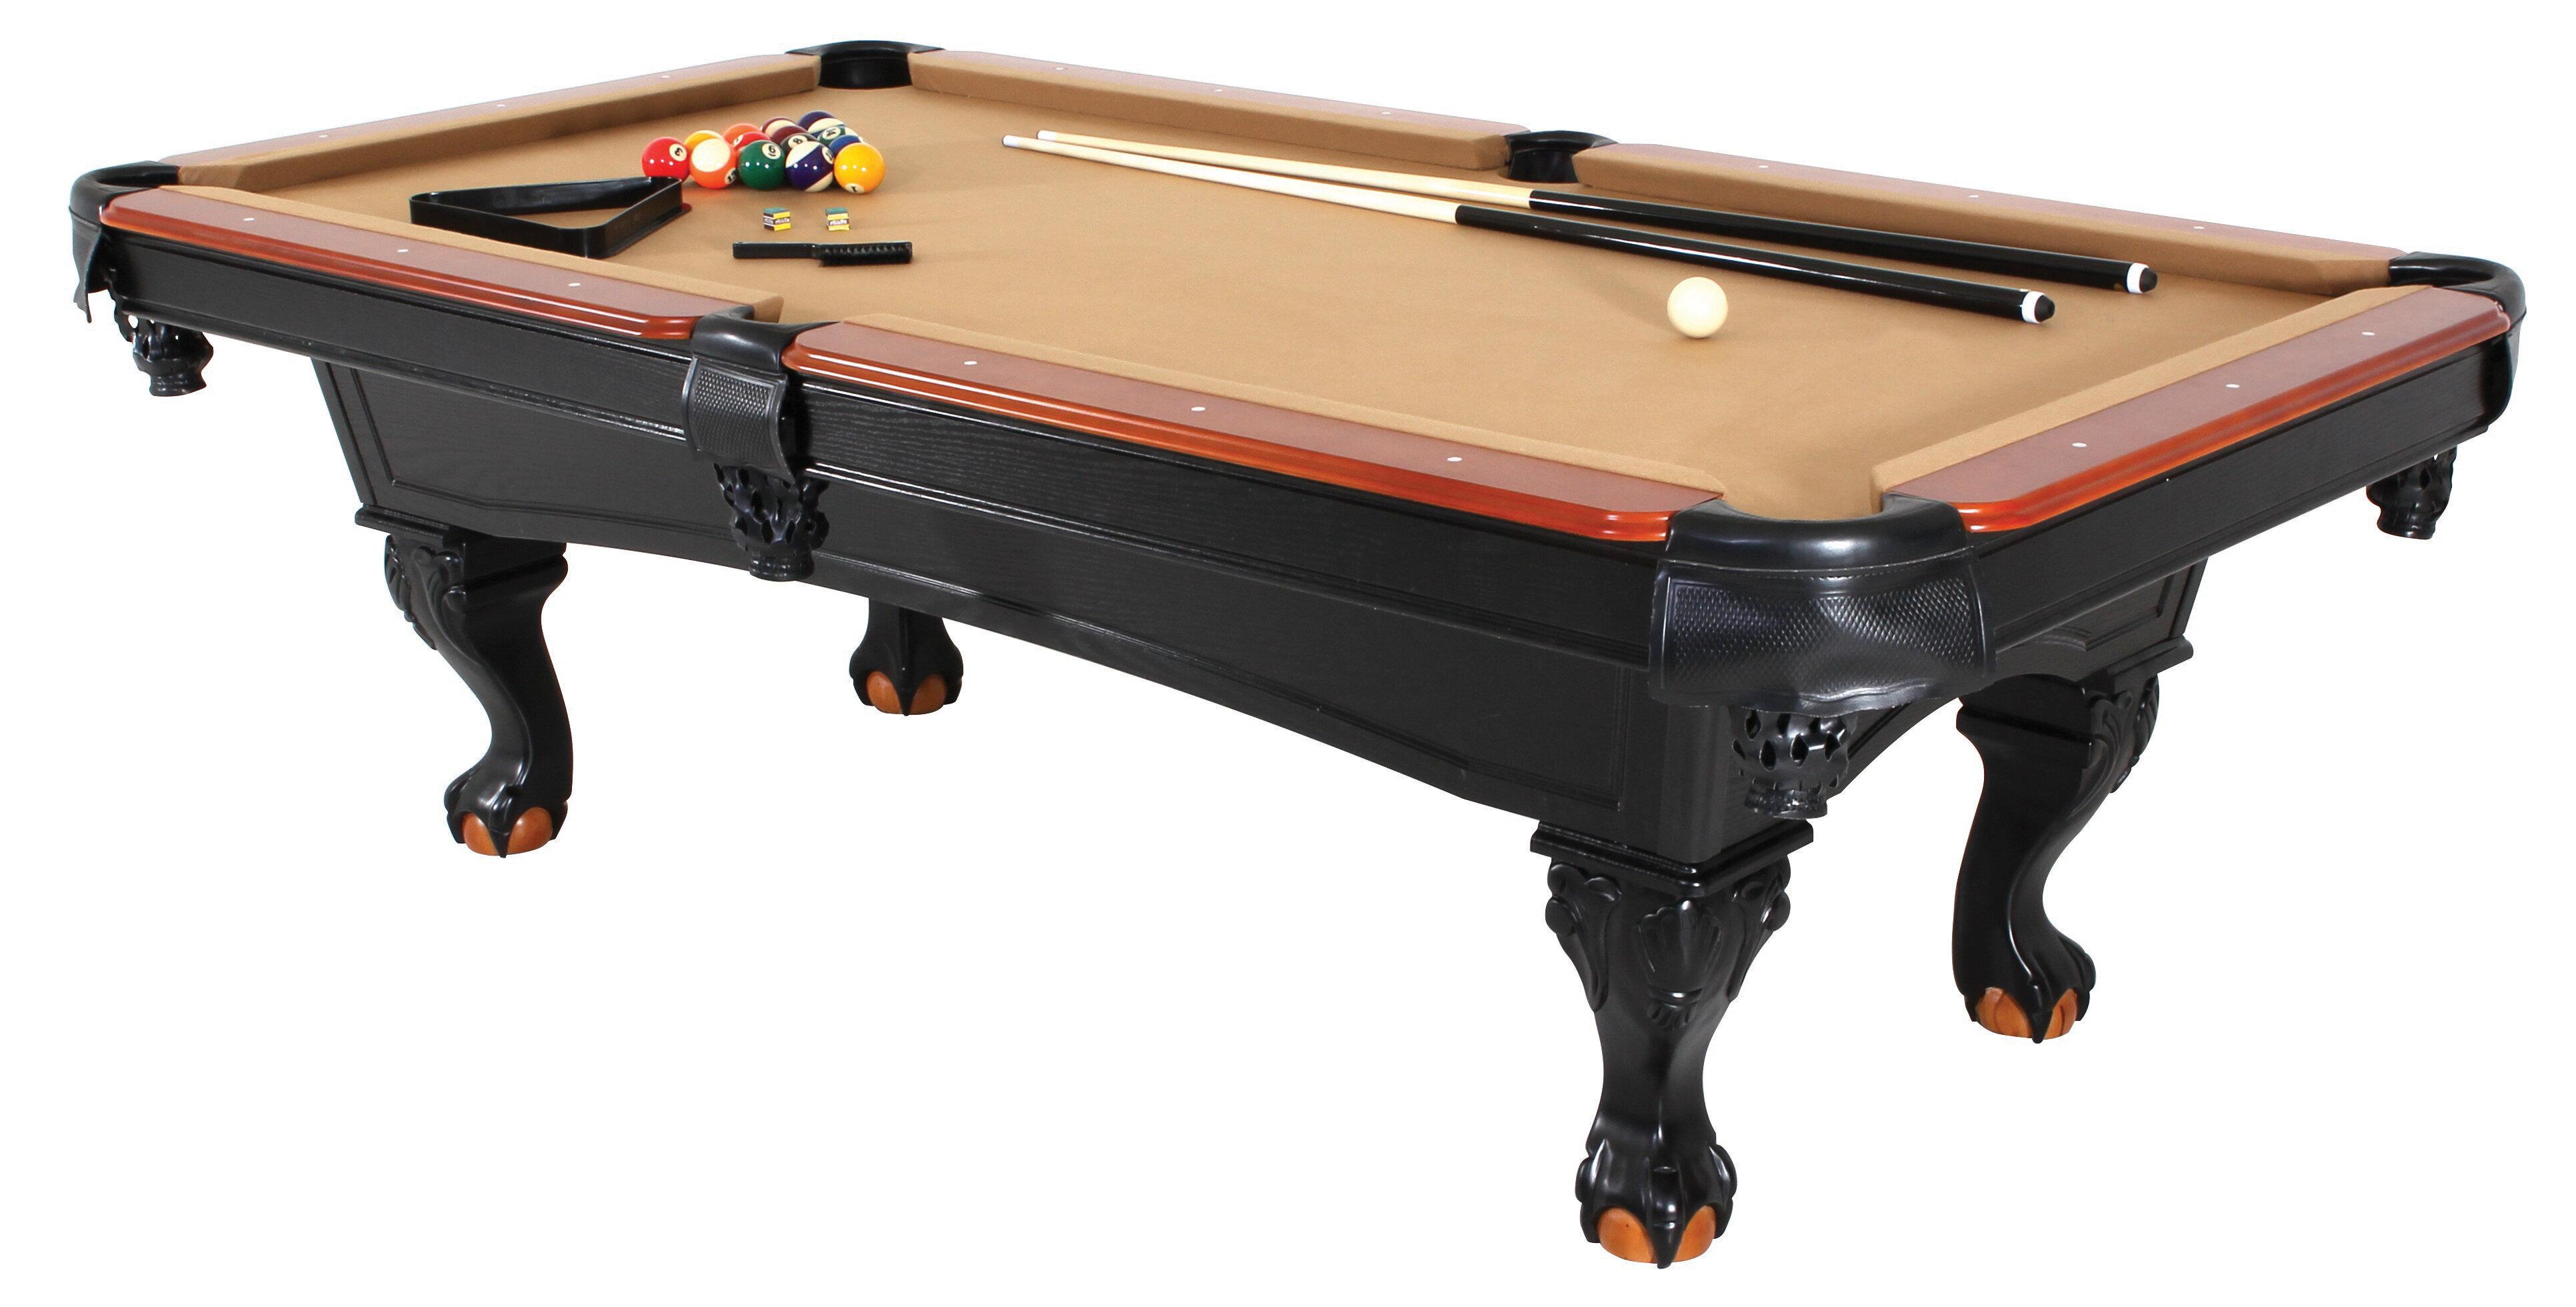 Minnesota Fats Minnesota Flats Covington™ 8' Pool Table & Reviews